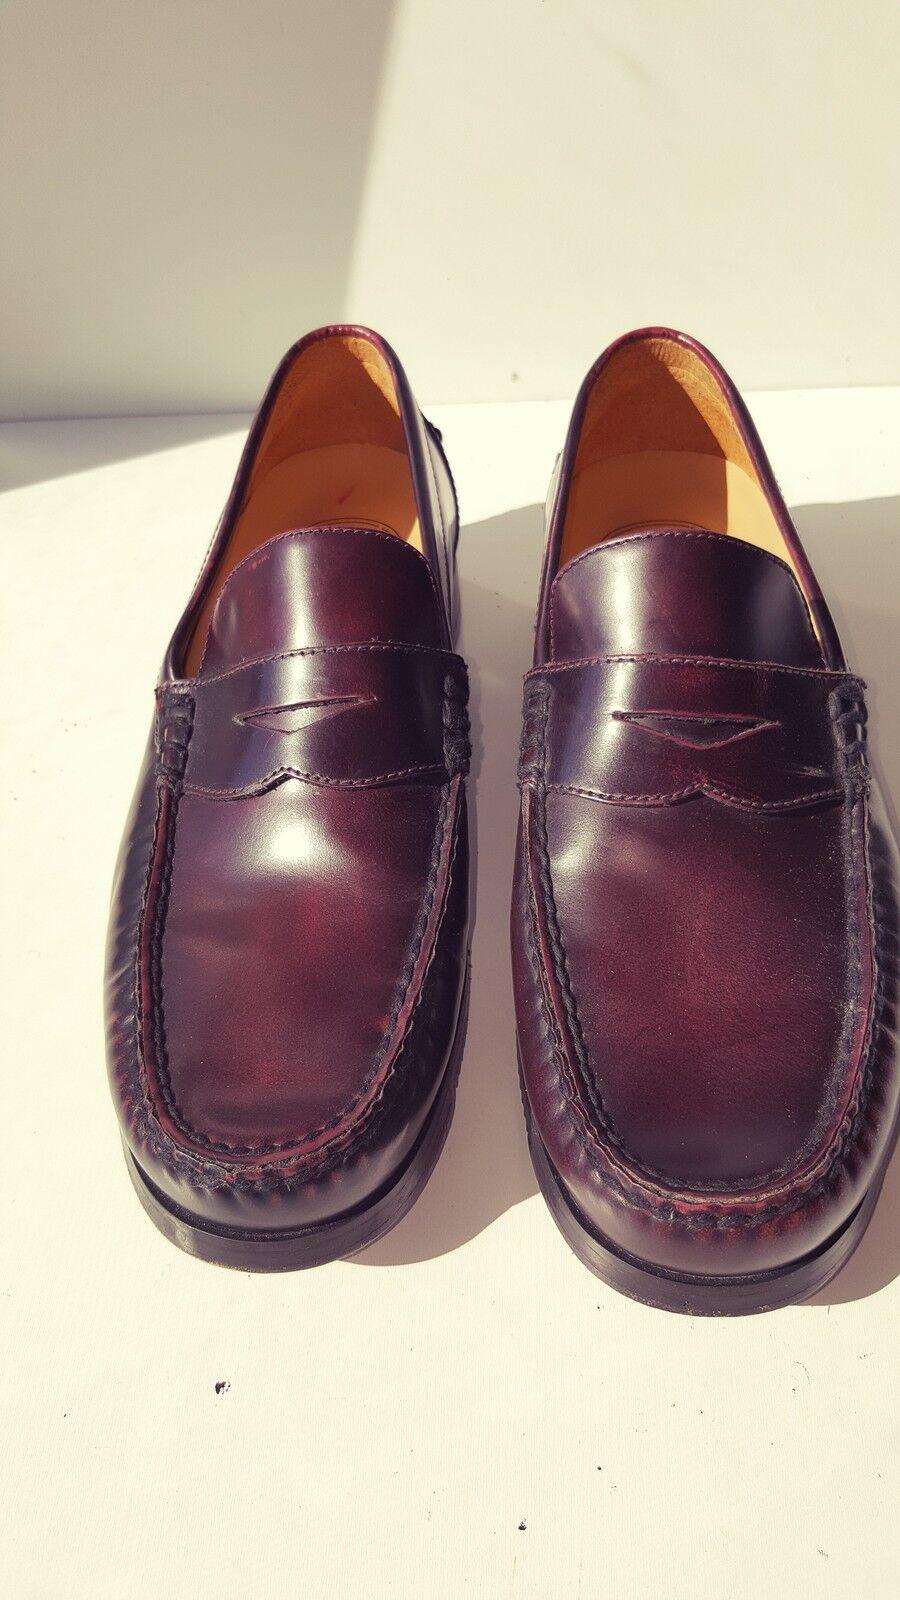 RockSport Burgundy Pelle Round-Toe Loafers 7M